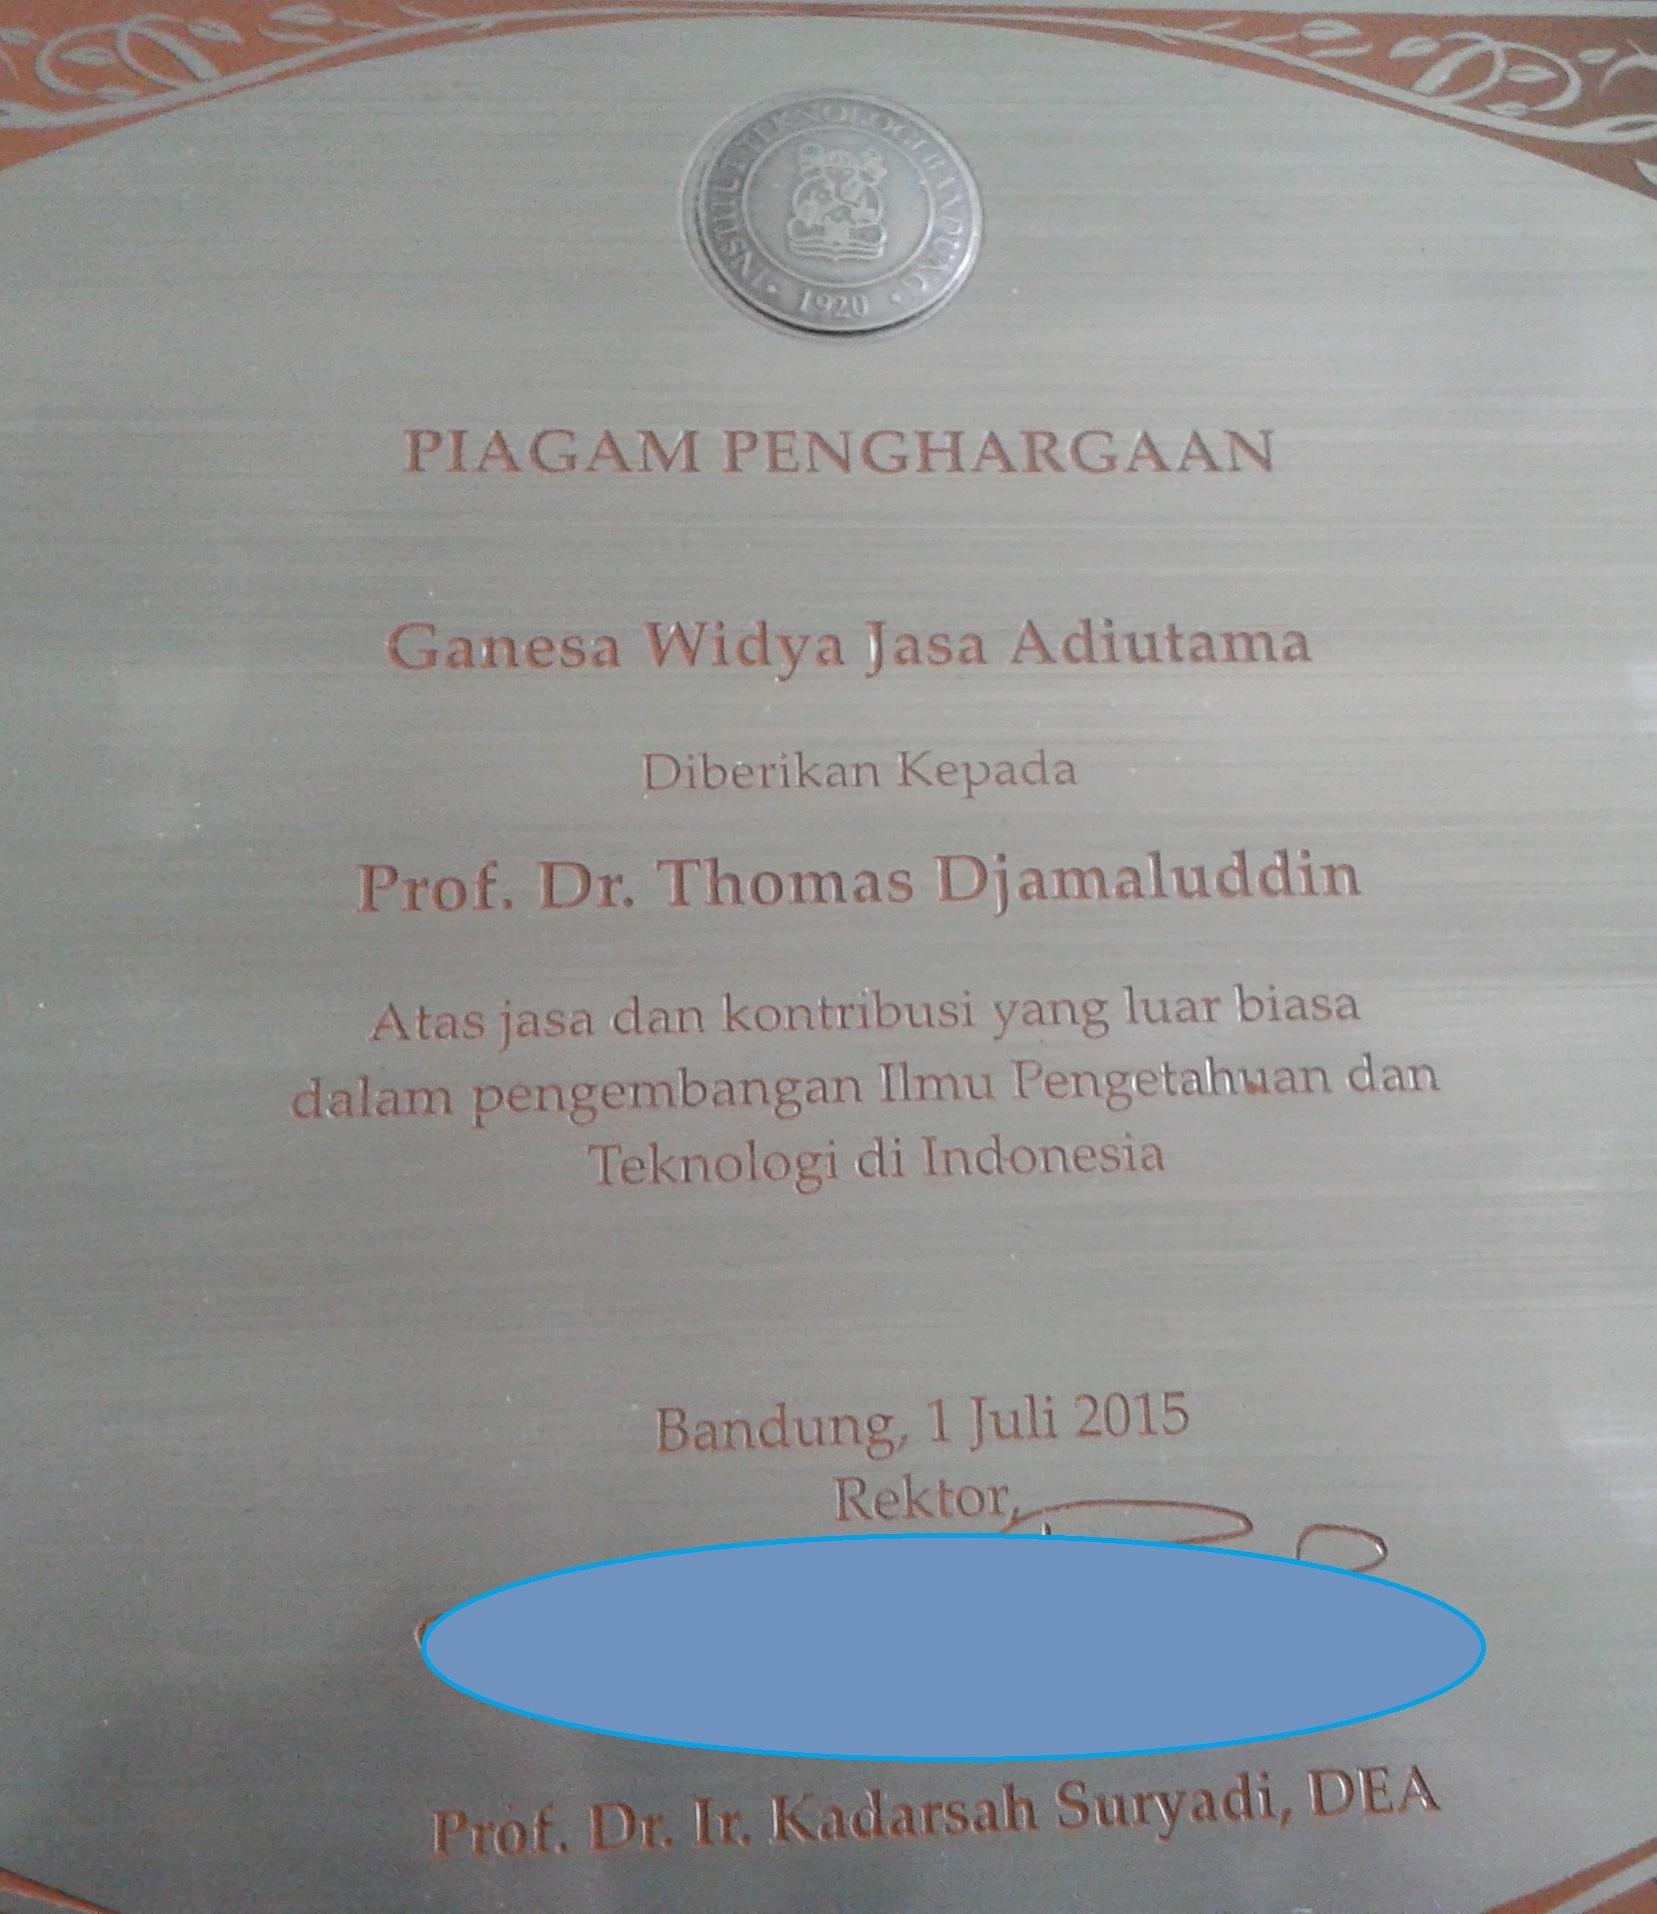 ganesha award 1